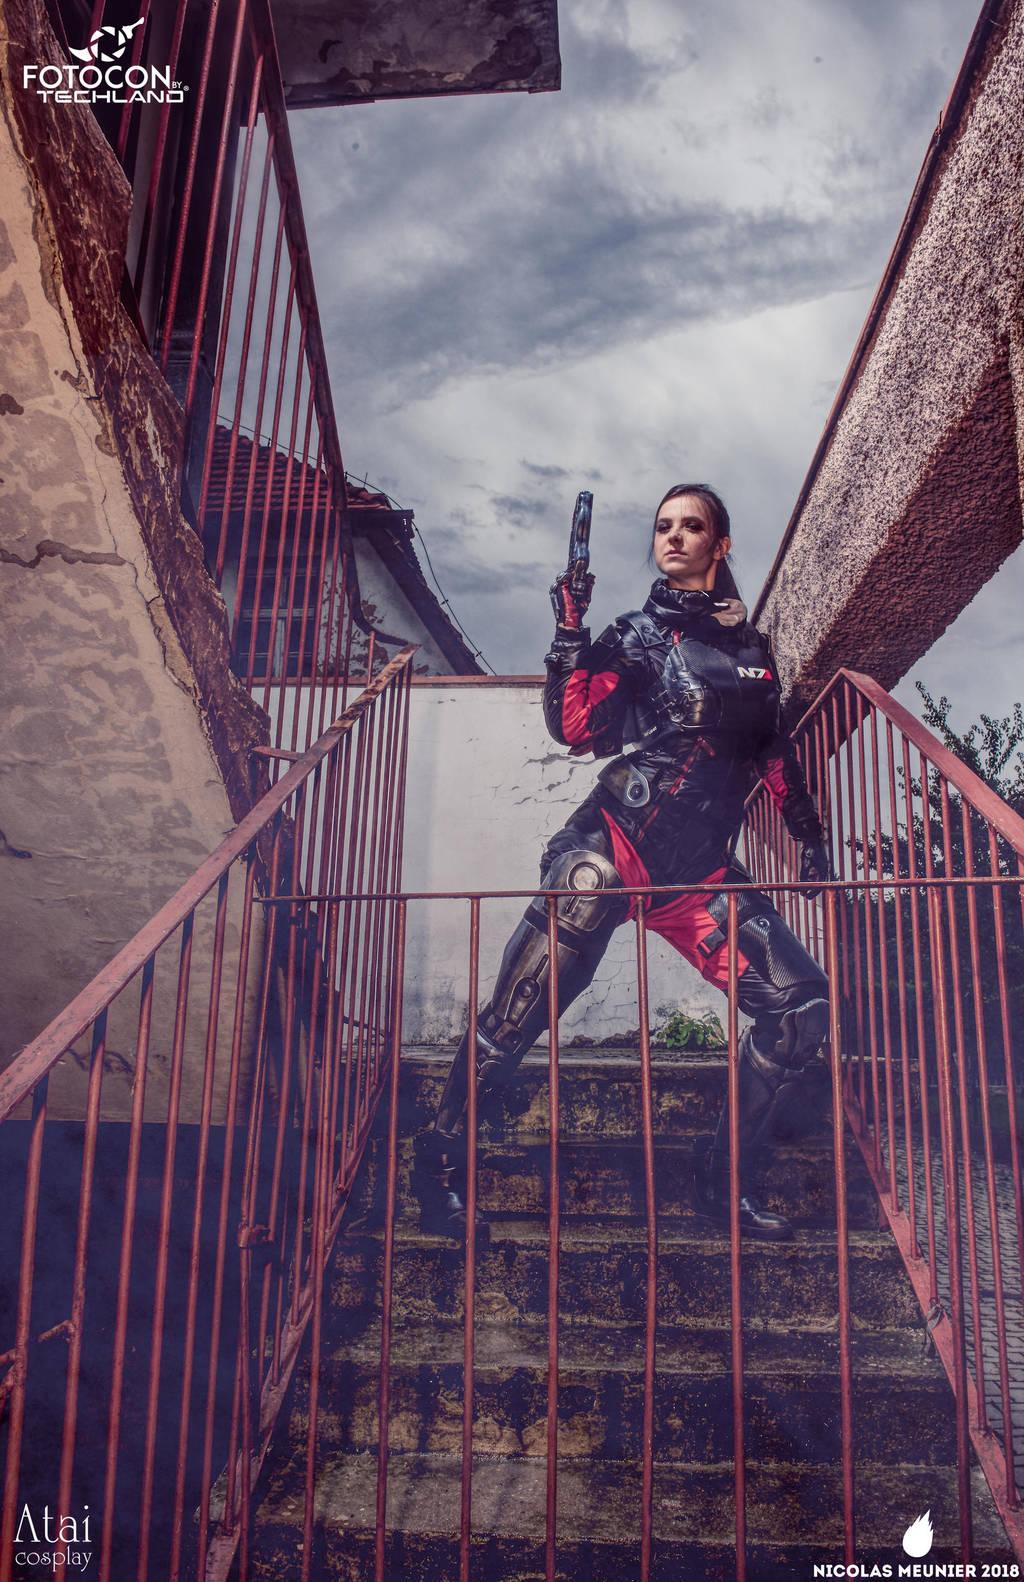 sara_ryder_mass_effect_andromeda_cosplay_by_atai_dchozoo-fullview Cosplay - Mass Effect Andromeda - Sara Ryder #162